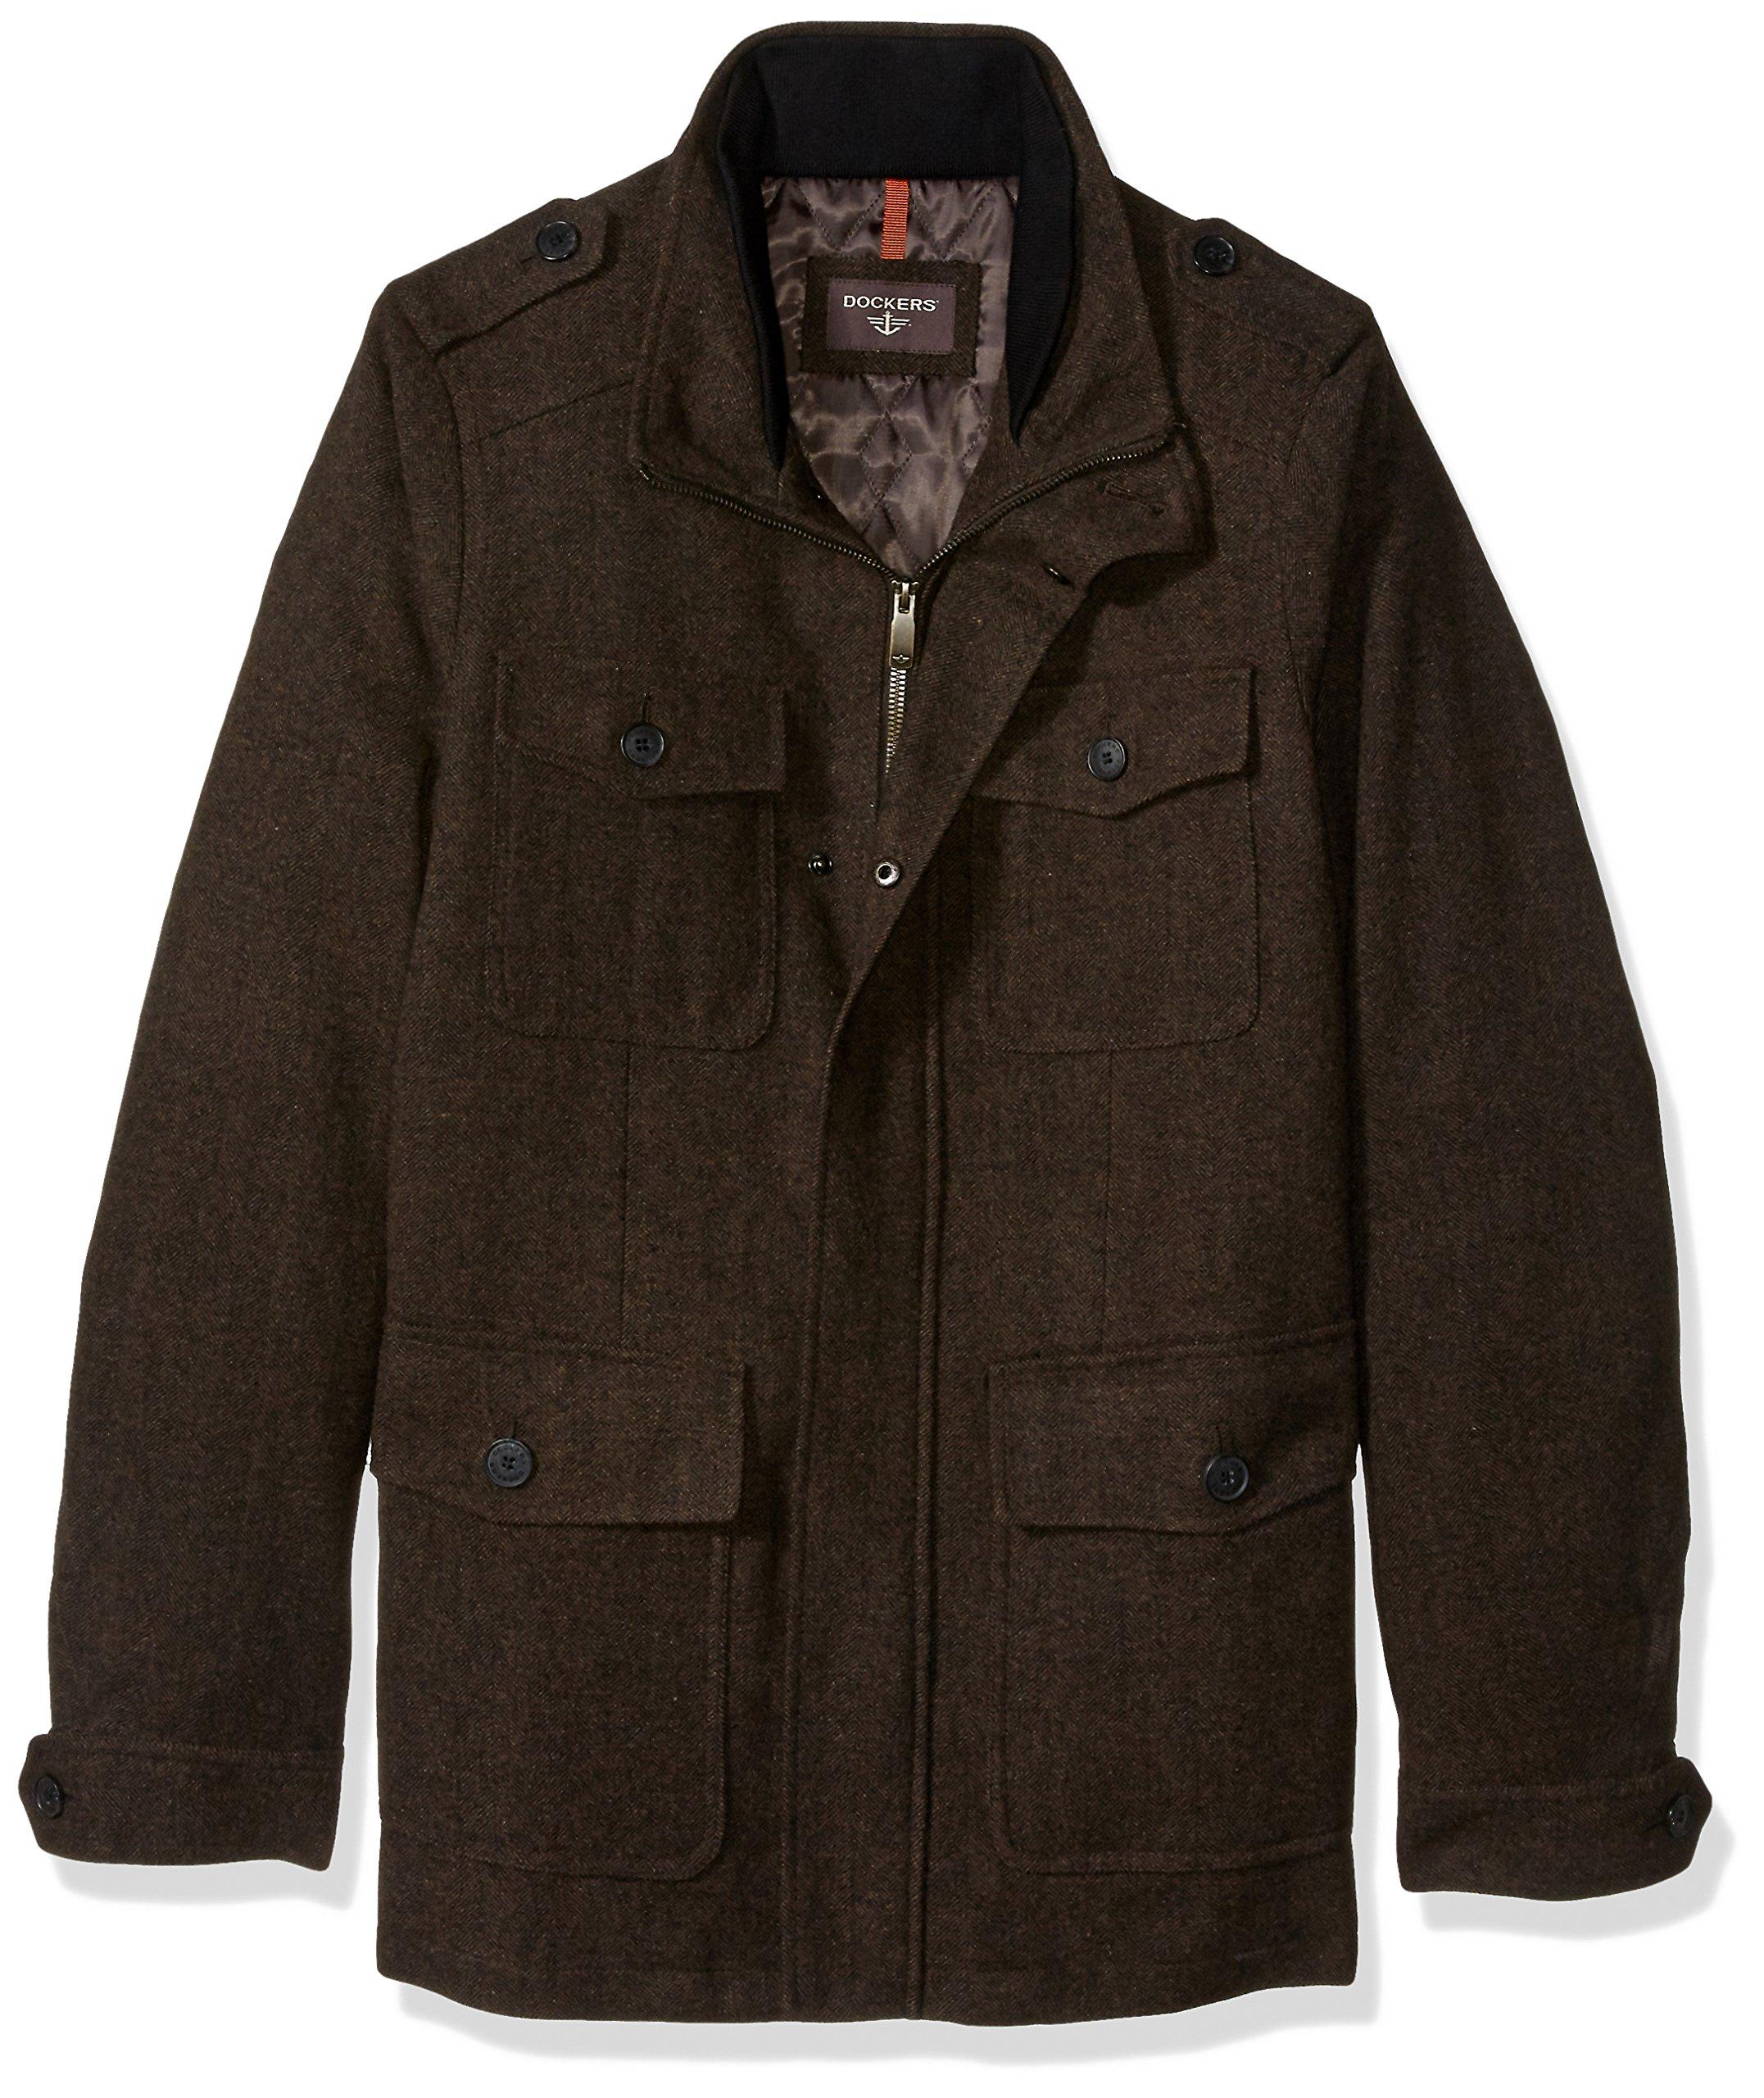 Dockers Men's Size Wool Fancy Four Pocket Military Jacket, Brown Herringbone, 2X-Large Tall